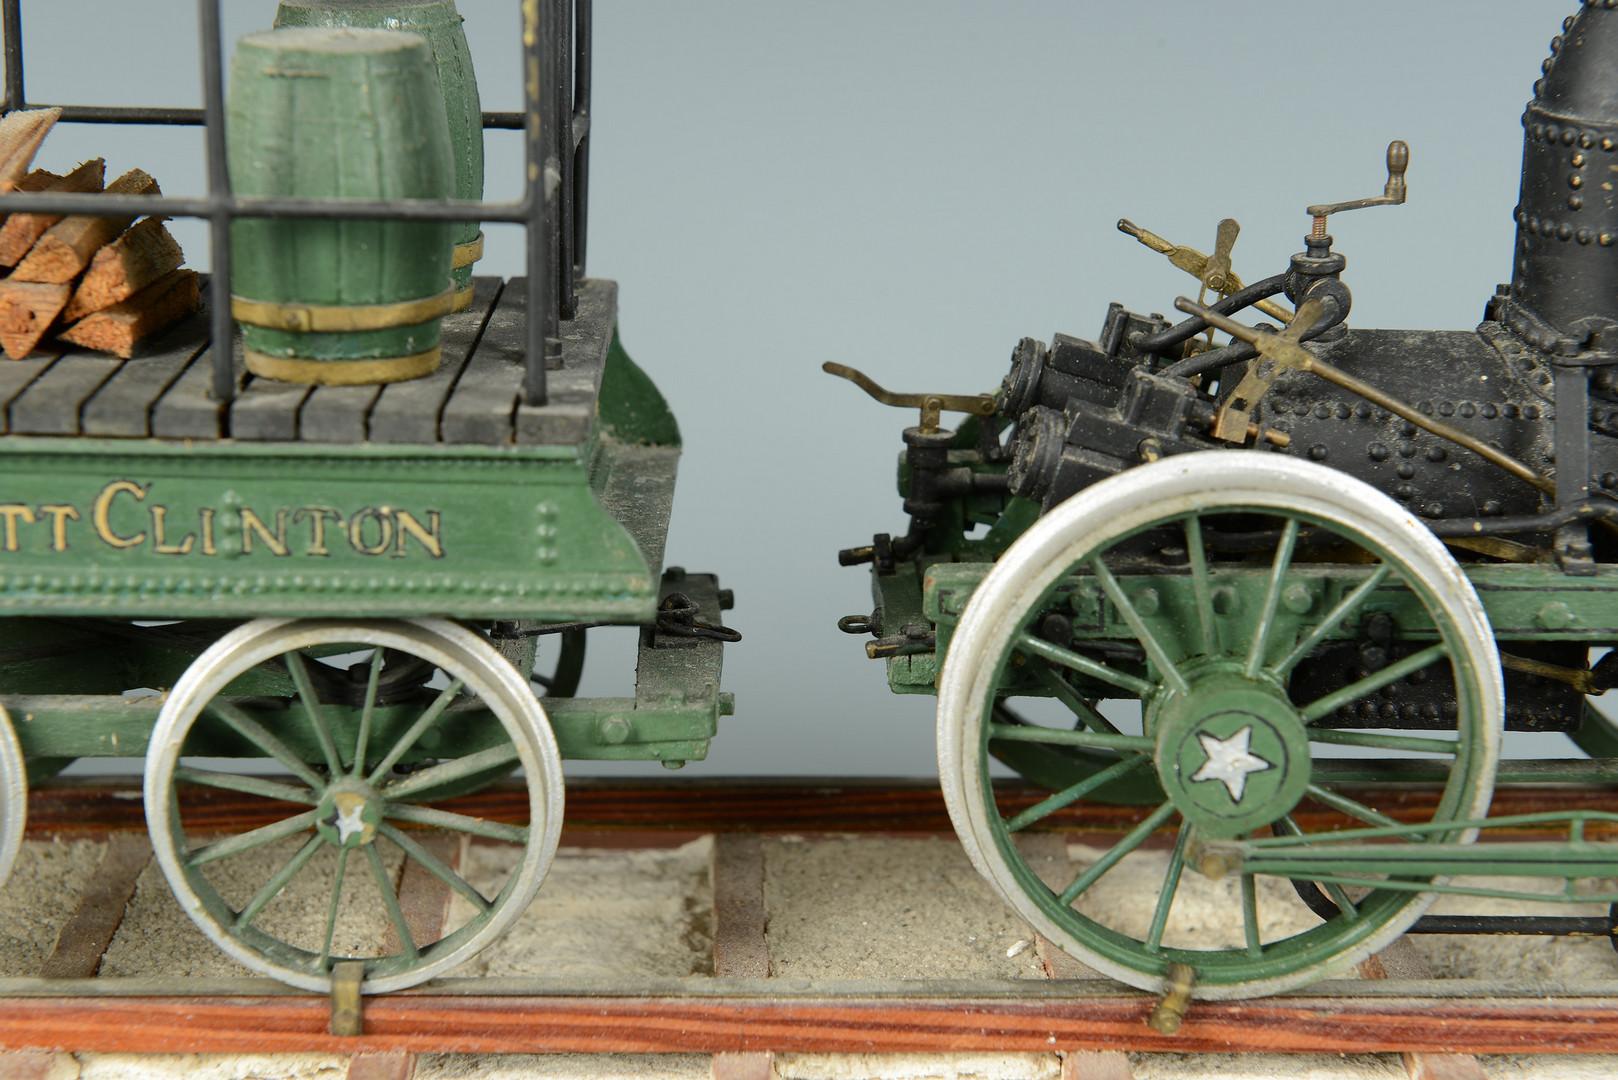 Lot 461: 1933 Dewitt Clinton Model Passenger Locomotive, Aw